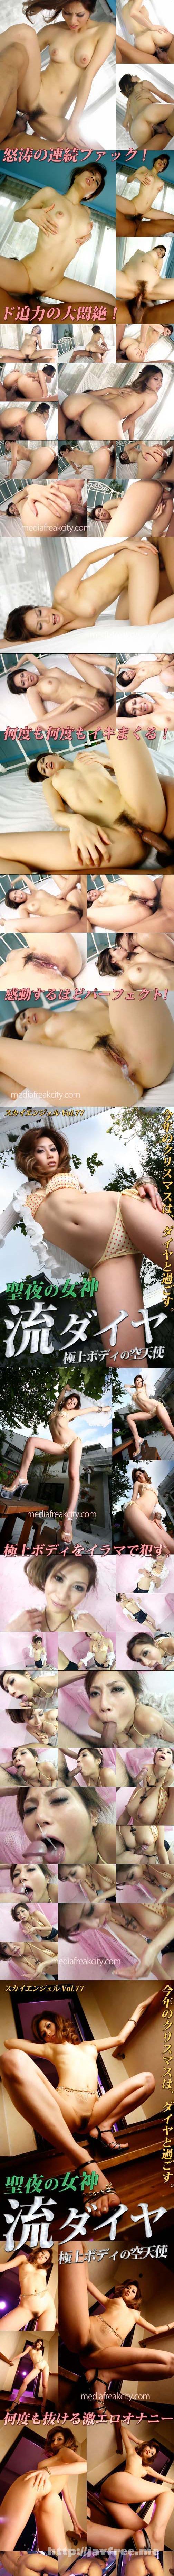 [SKY 121] スカイエンジェル Vol.77 : 流ダイヤ 流ダイヤ SKY Daiya Nagare